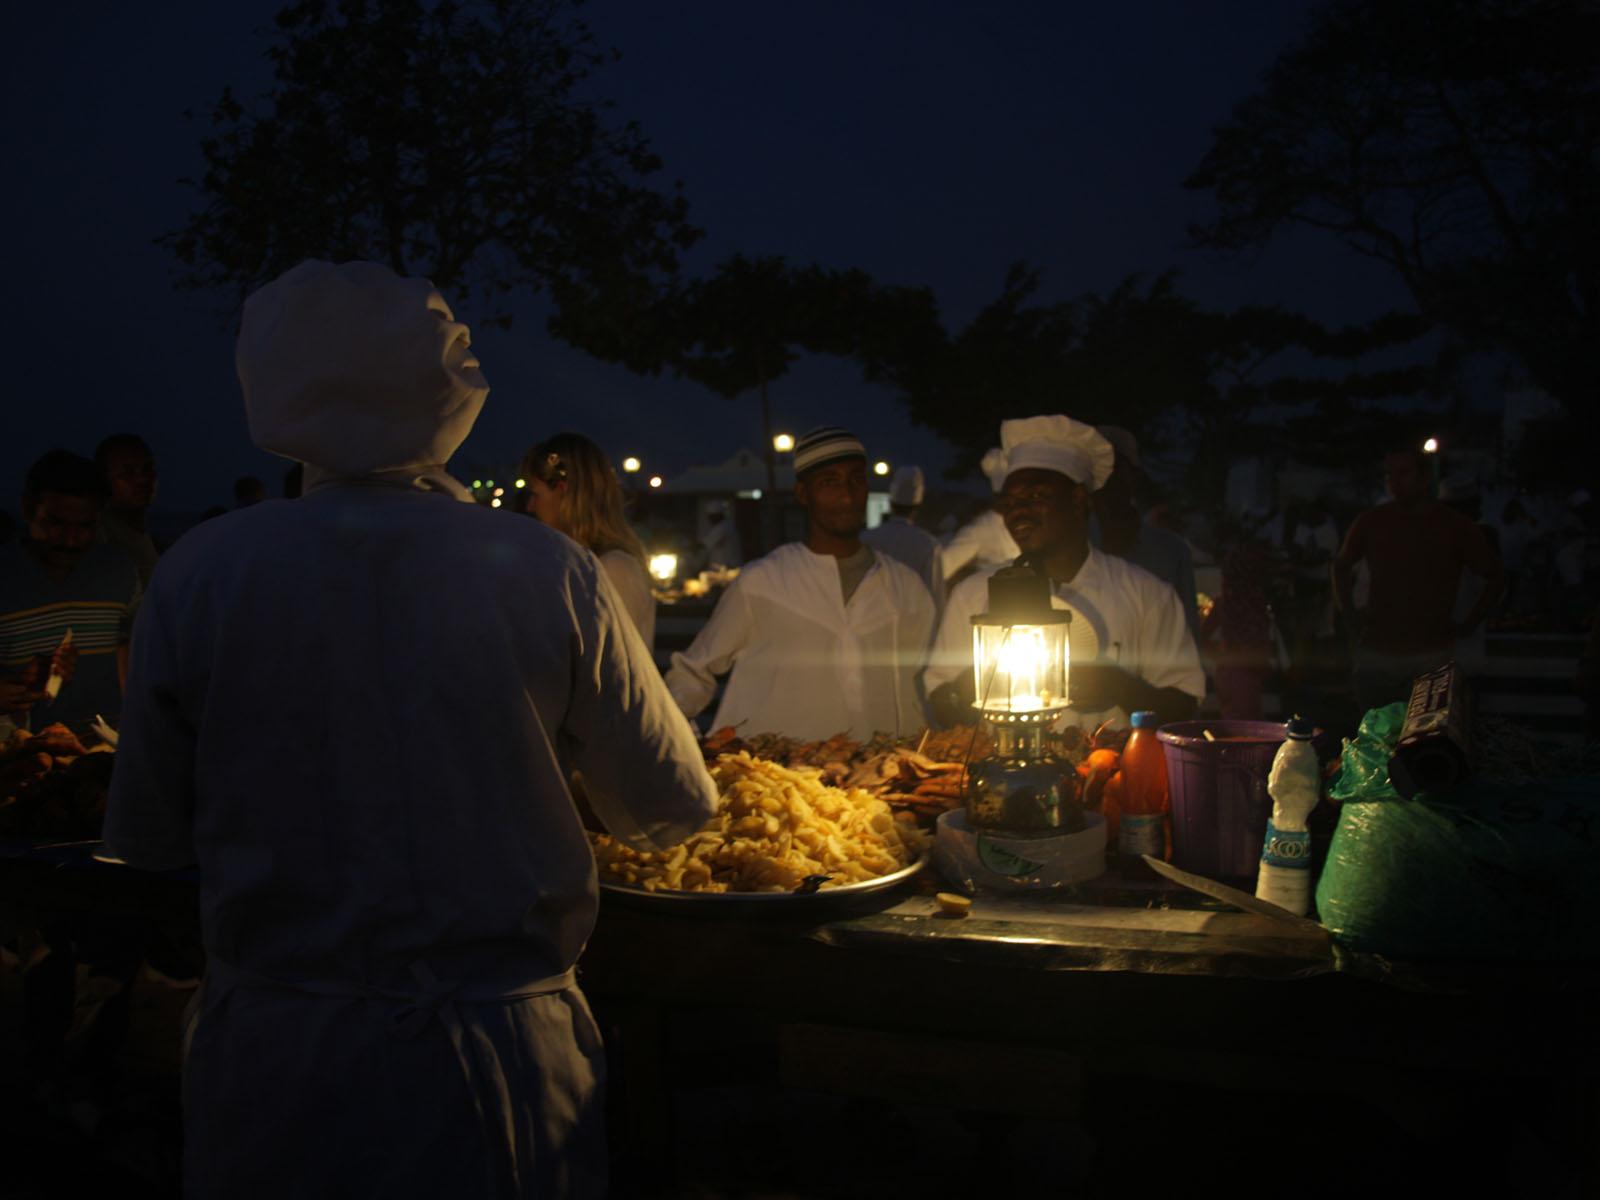 Gallery Tours & Safari - Dining & nightlife